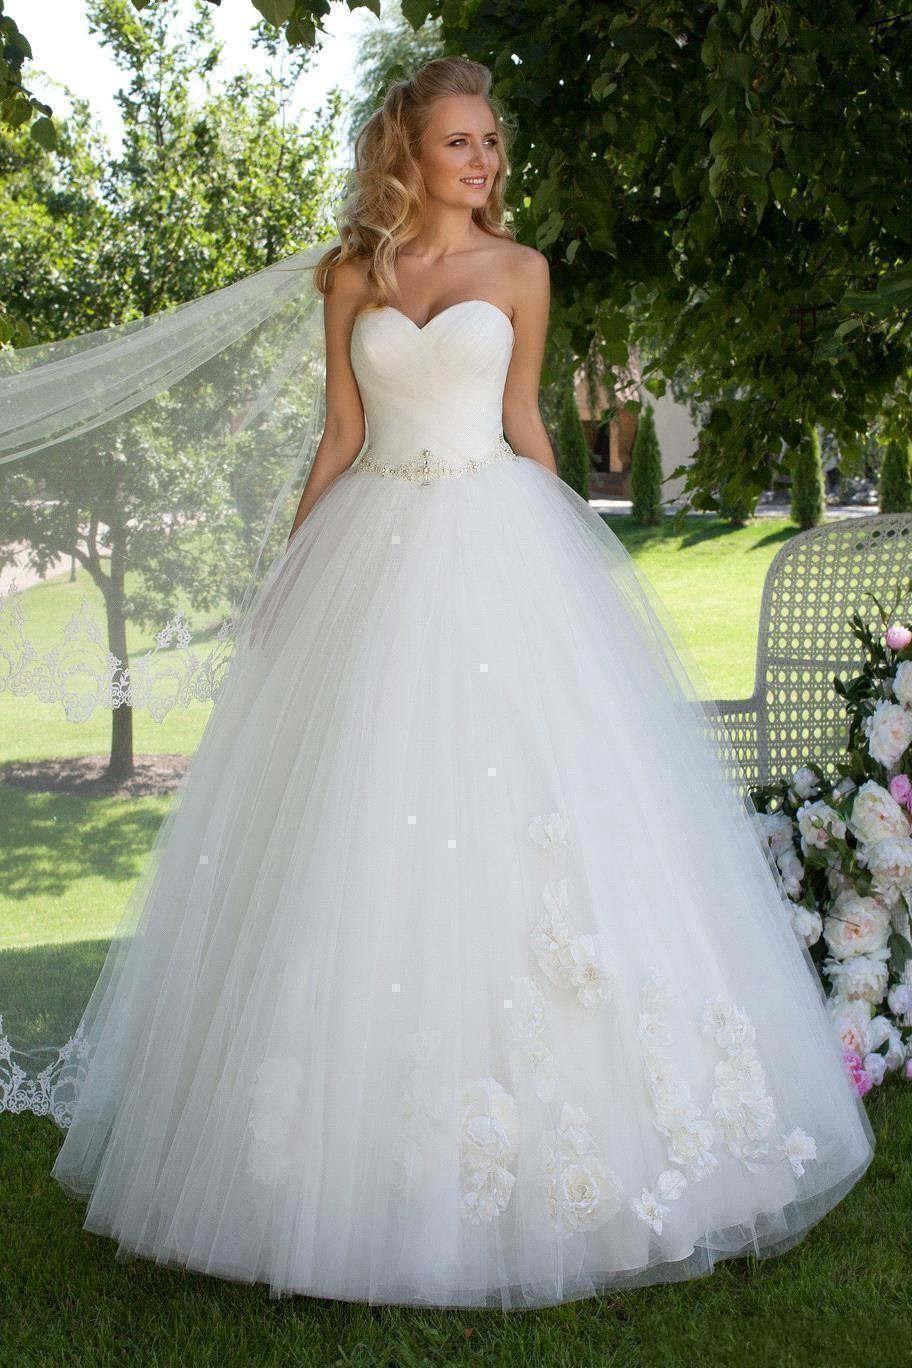 New ivorywhite lace beach wedding dress ball gown dresses custom